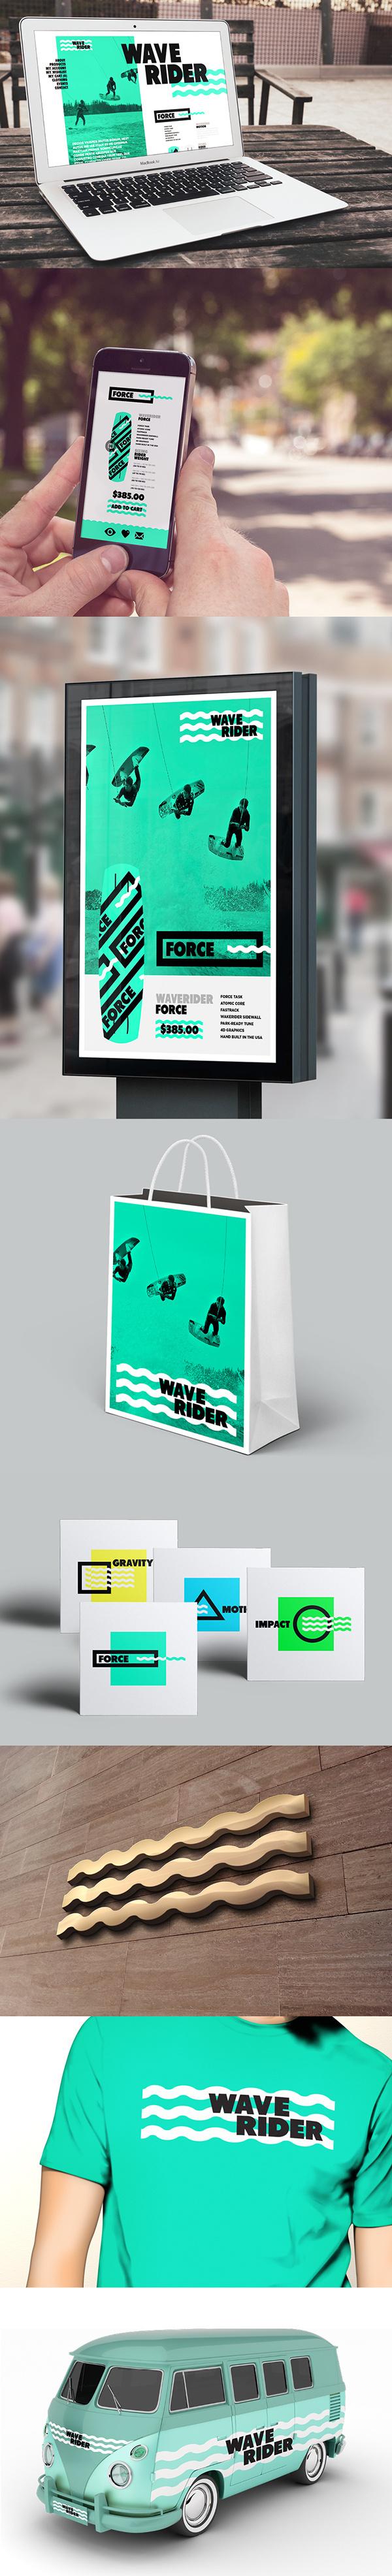 WAVERIDER // Branding on Behance #logo #identity #shape #green #branding #black #sea #water